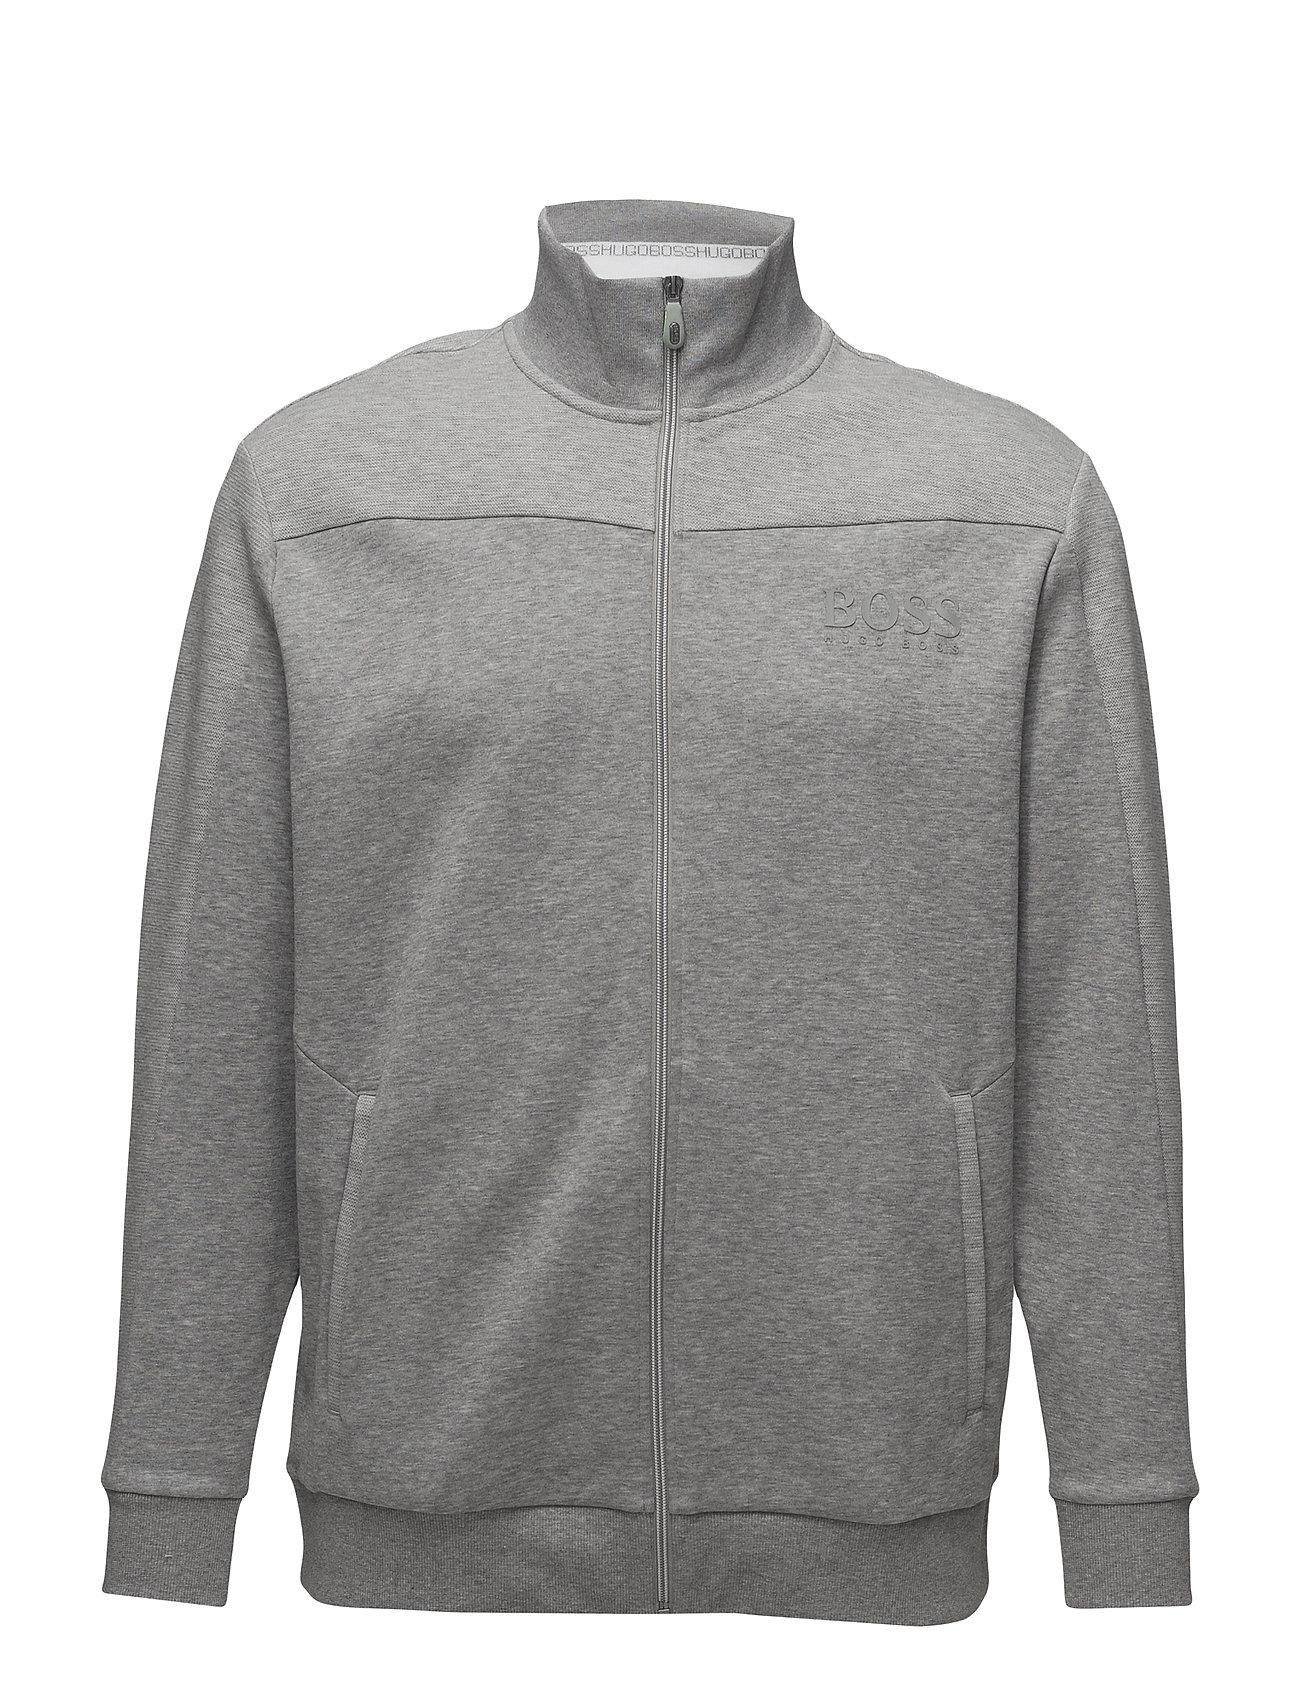 Sweatshirt & Hoodie im Sale - Bkaz